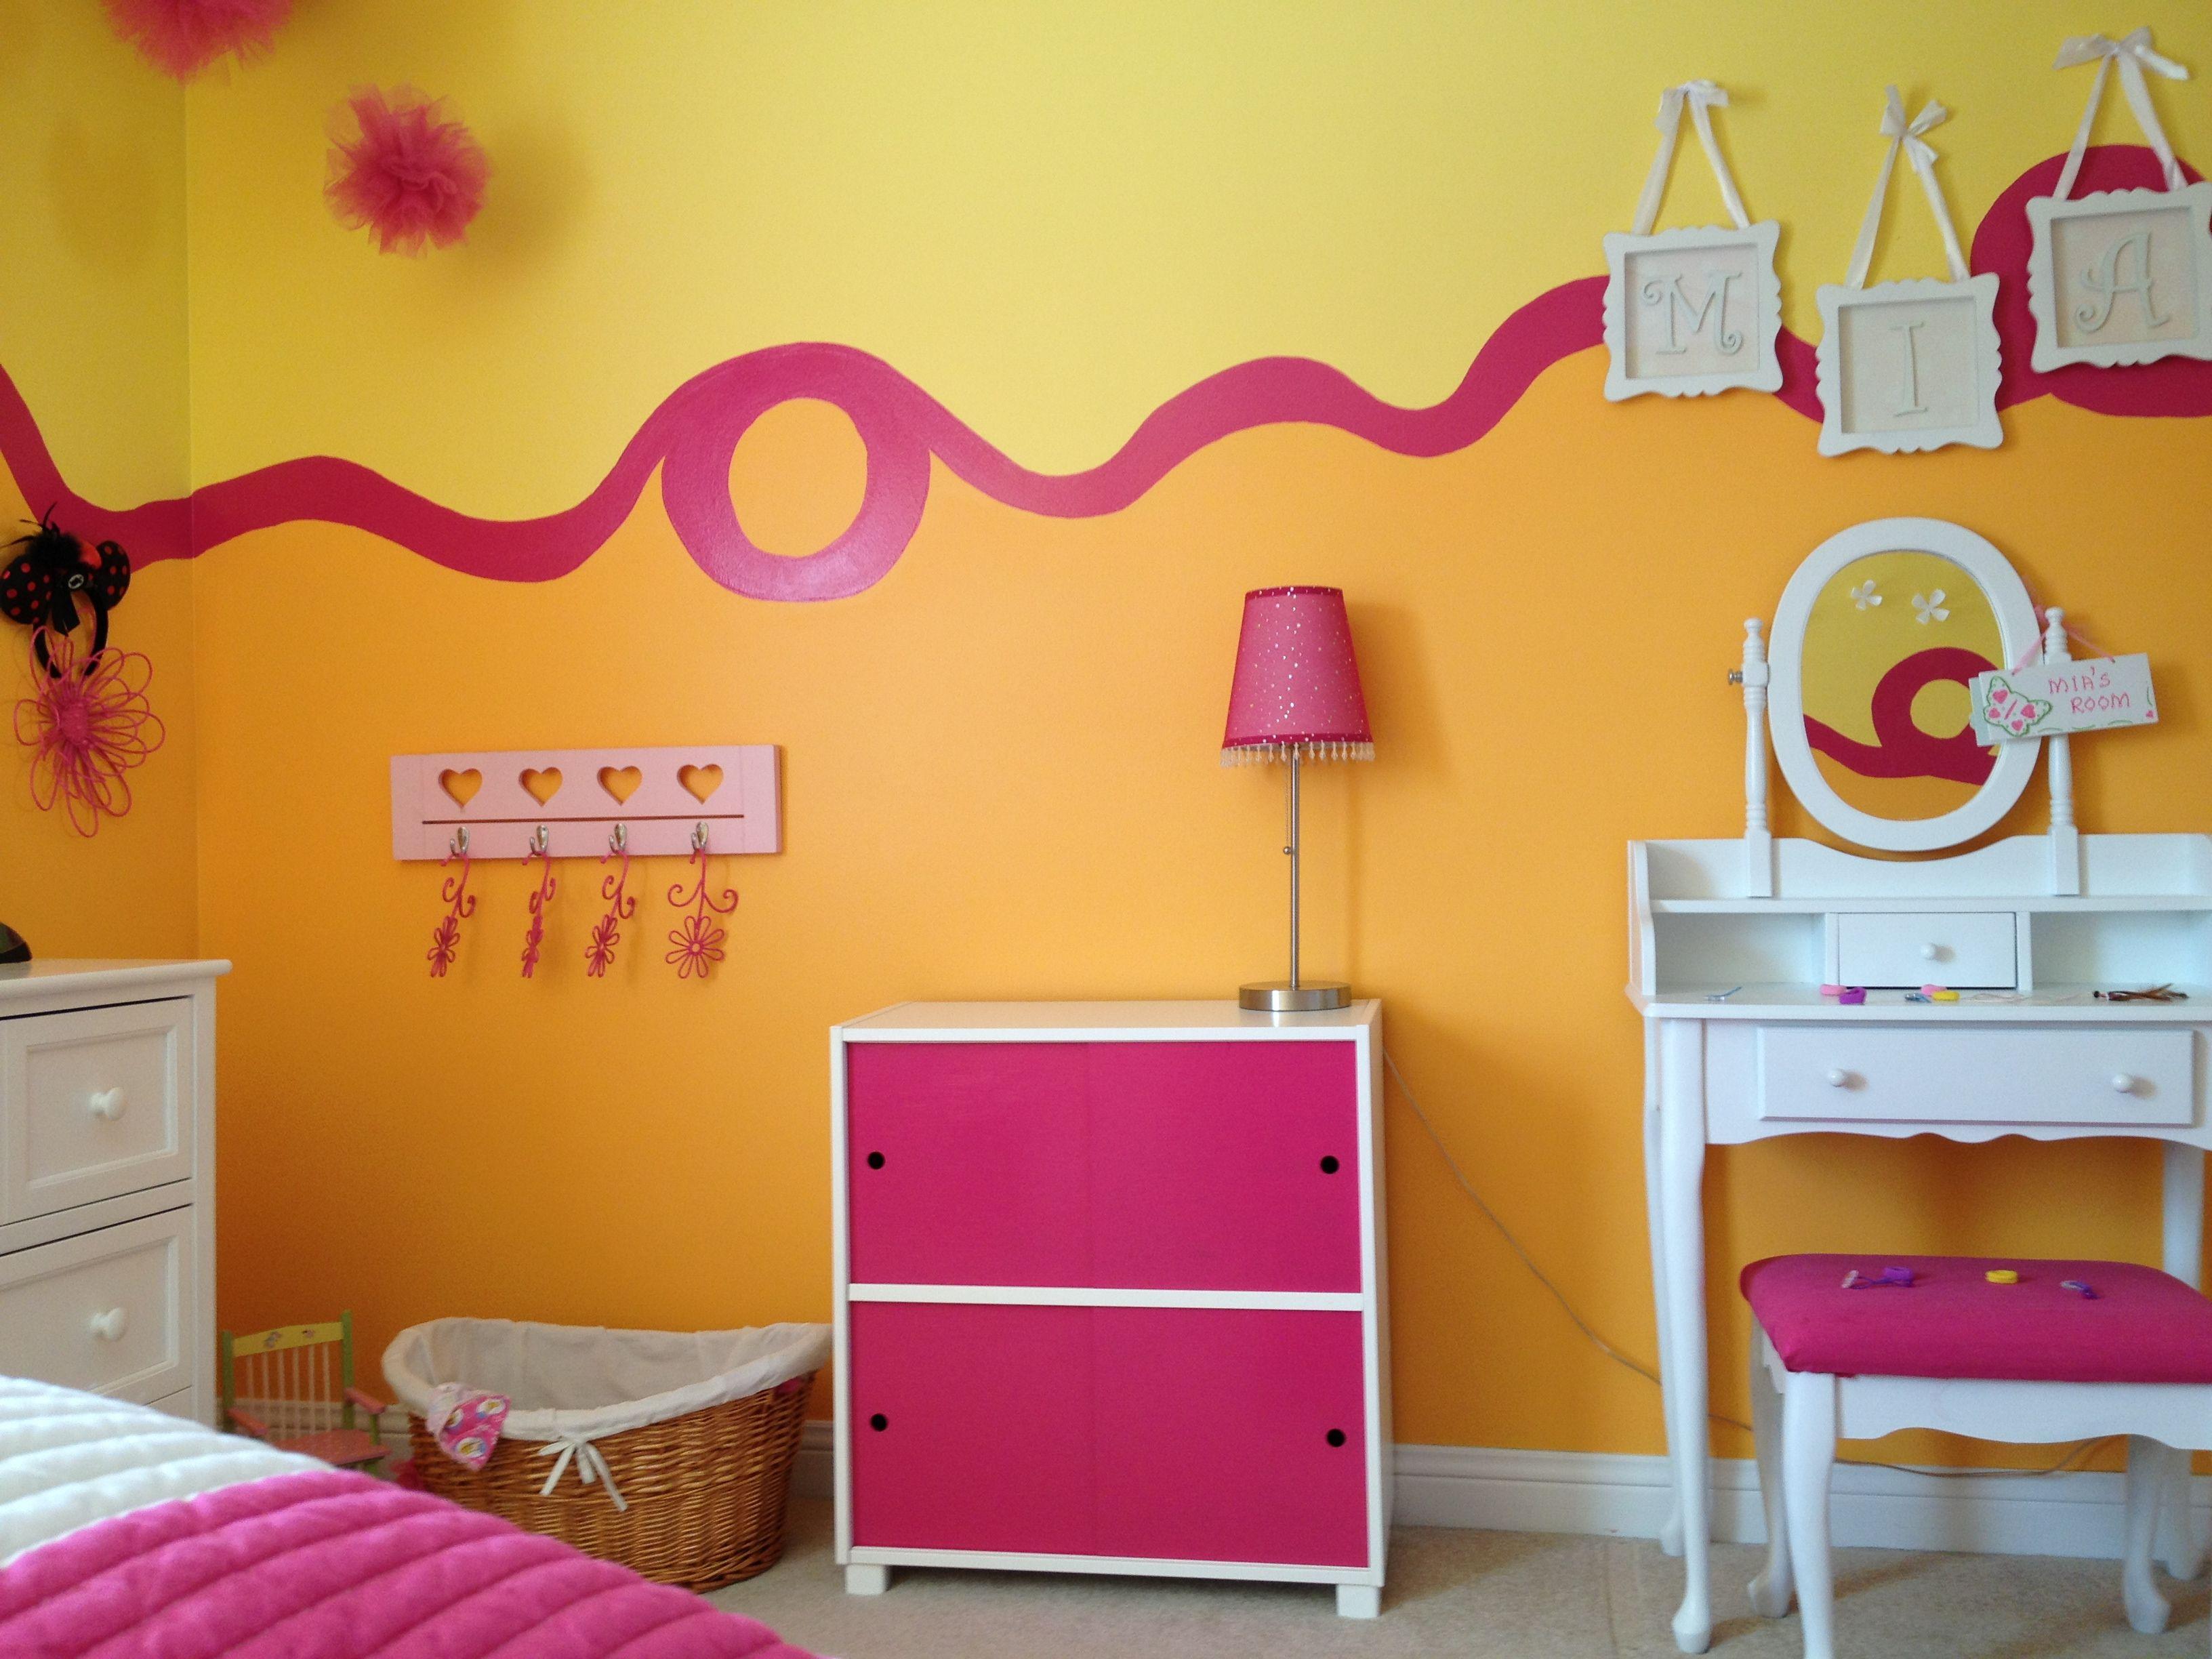 Cool paint idea... | Girls\' room ideas | Pinterest | Paint ideas ...